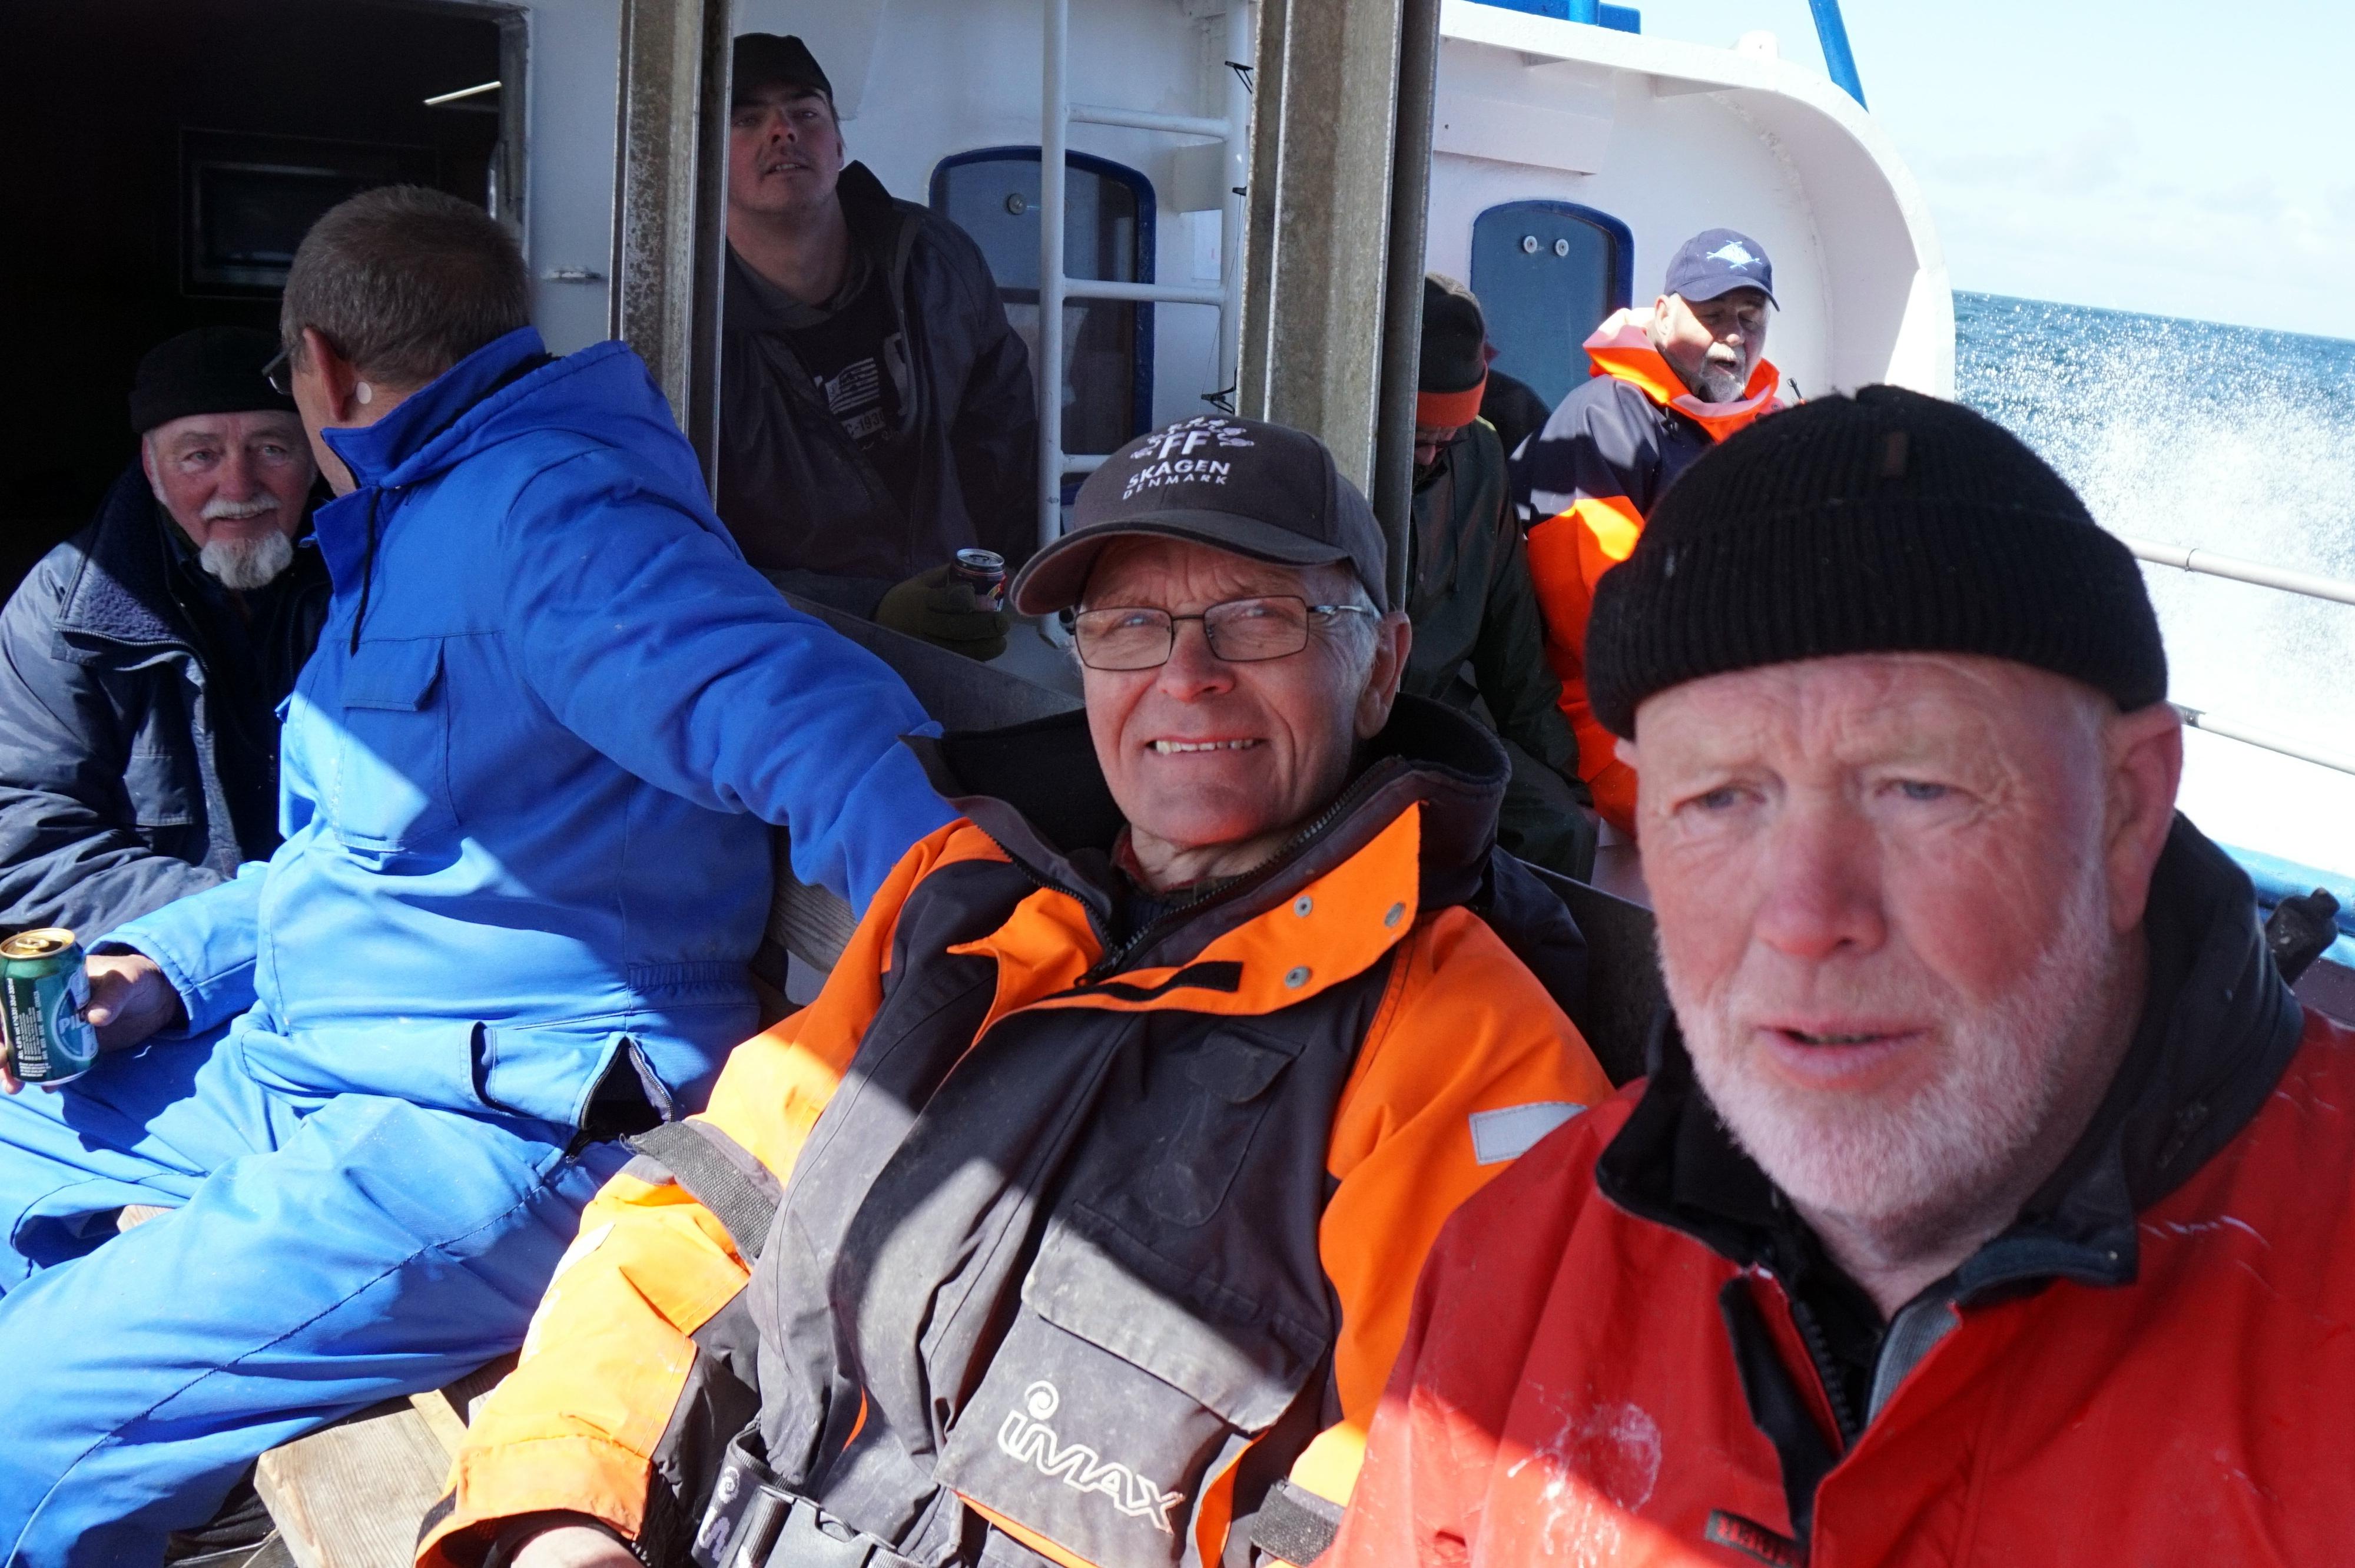 Det_Gule_Rev_2015_Vejle_amatørfiskerforening.jpg